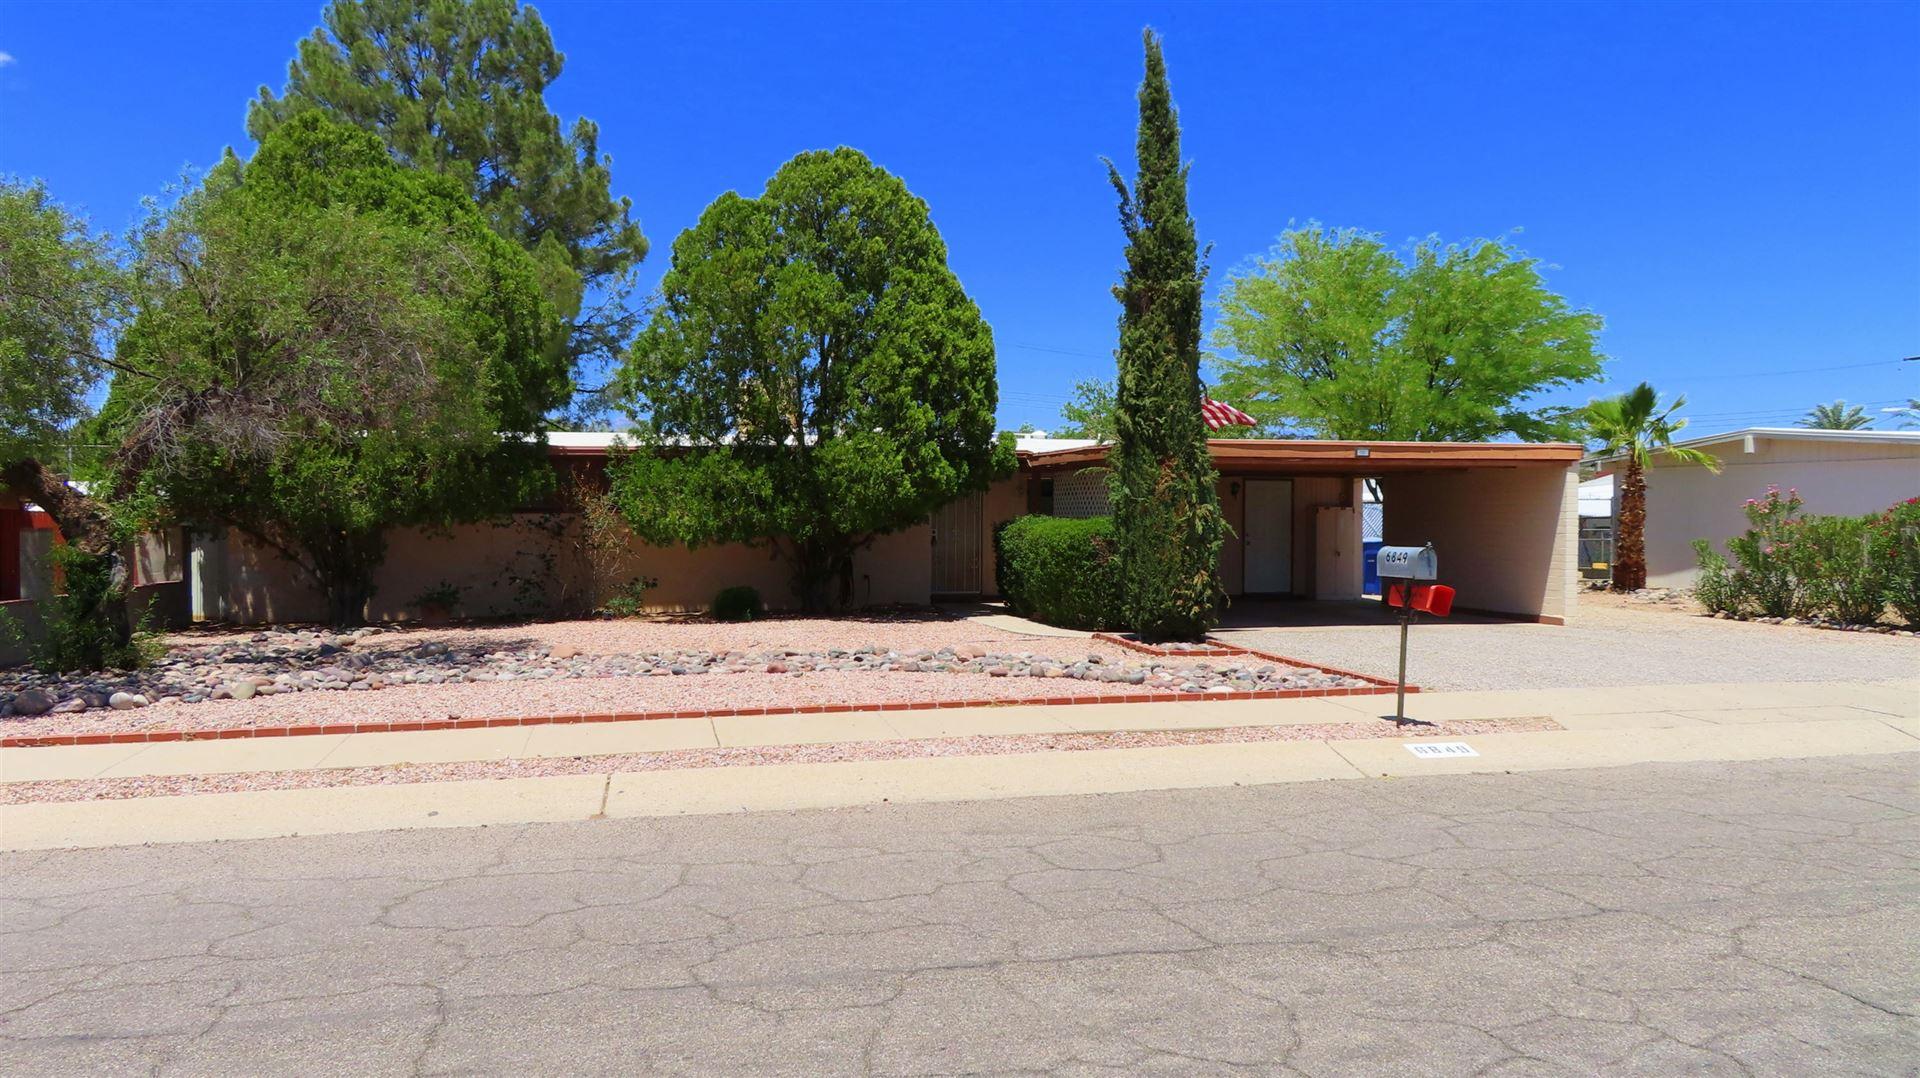 6849 E 39th Street, Tucson, AZ 85730 - MLS#: 22112172